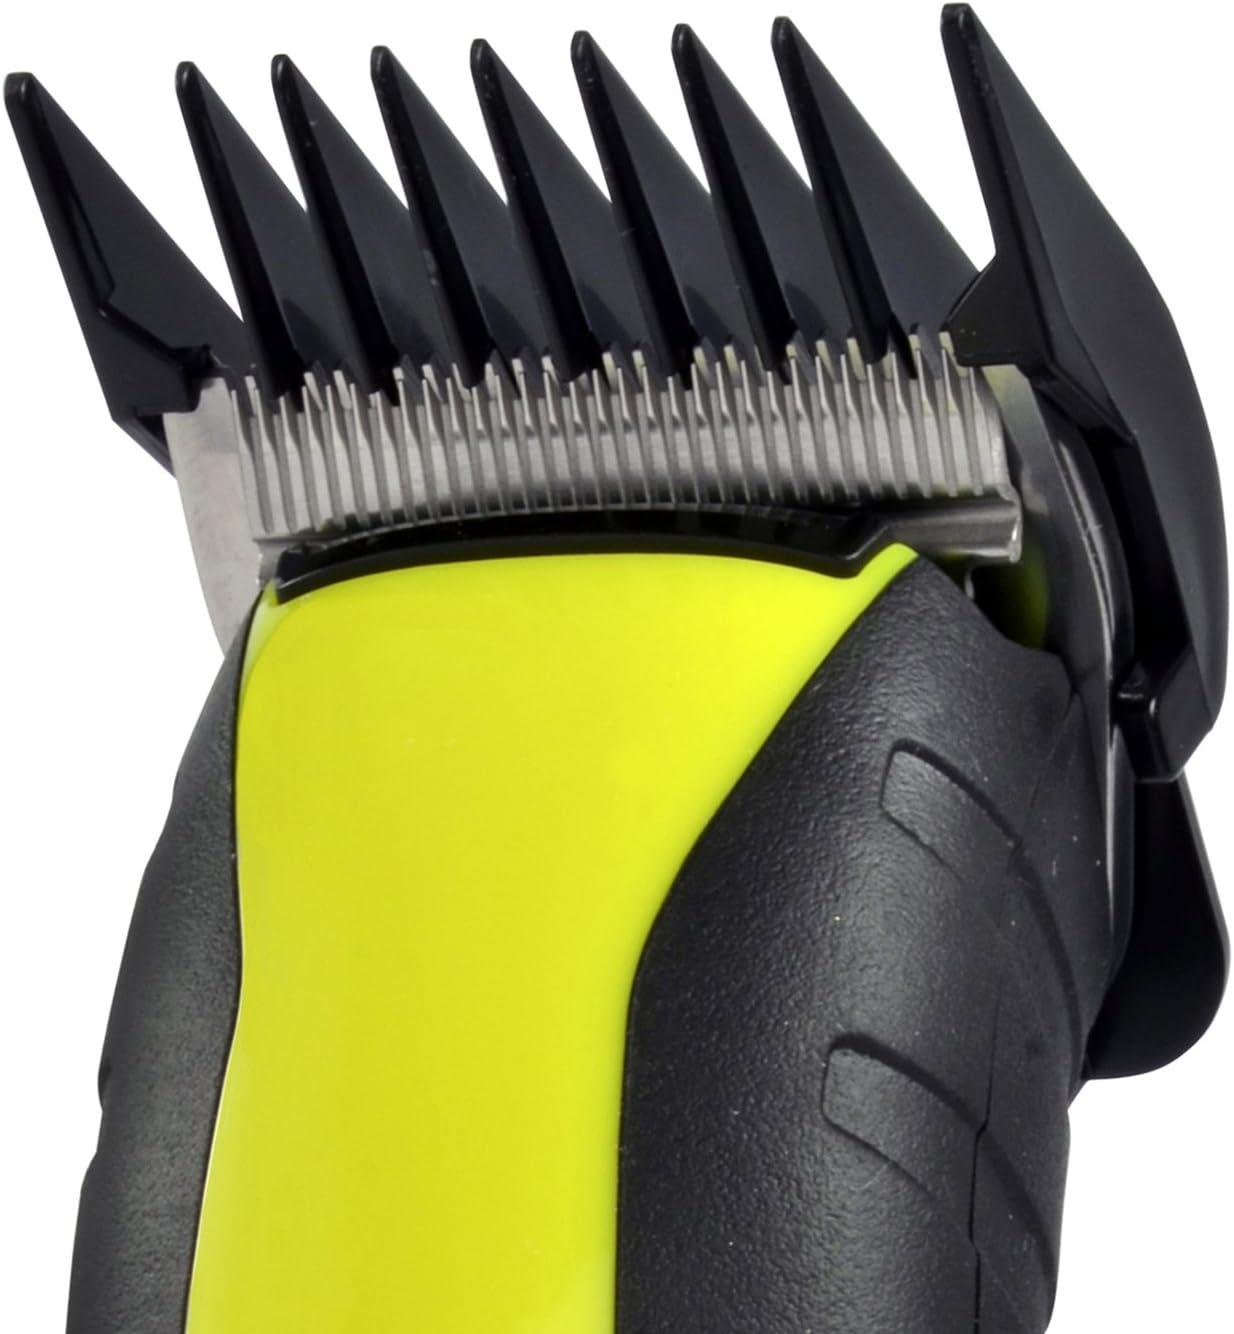 Furminator Comfort Pro Grooming Clipper 12 Piece Set